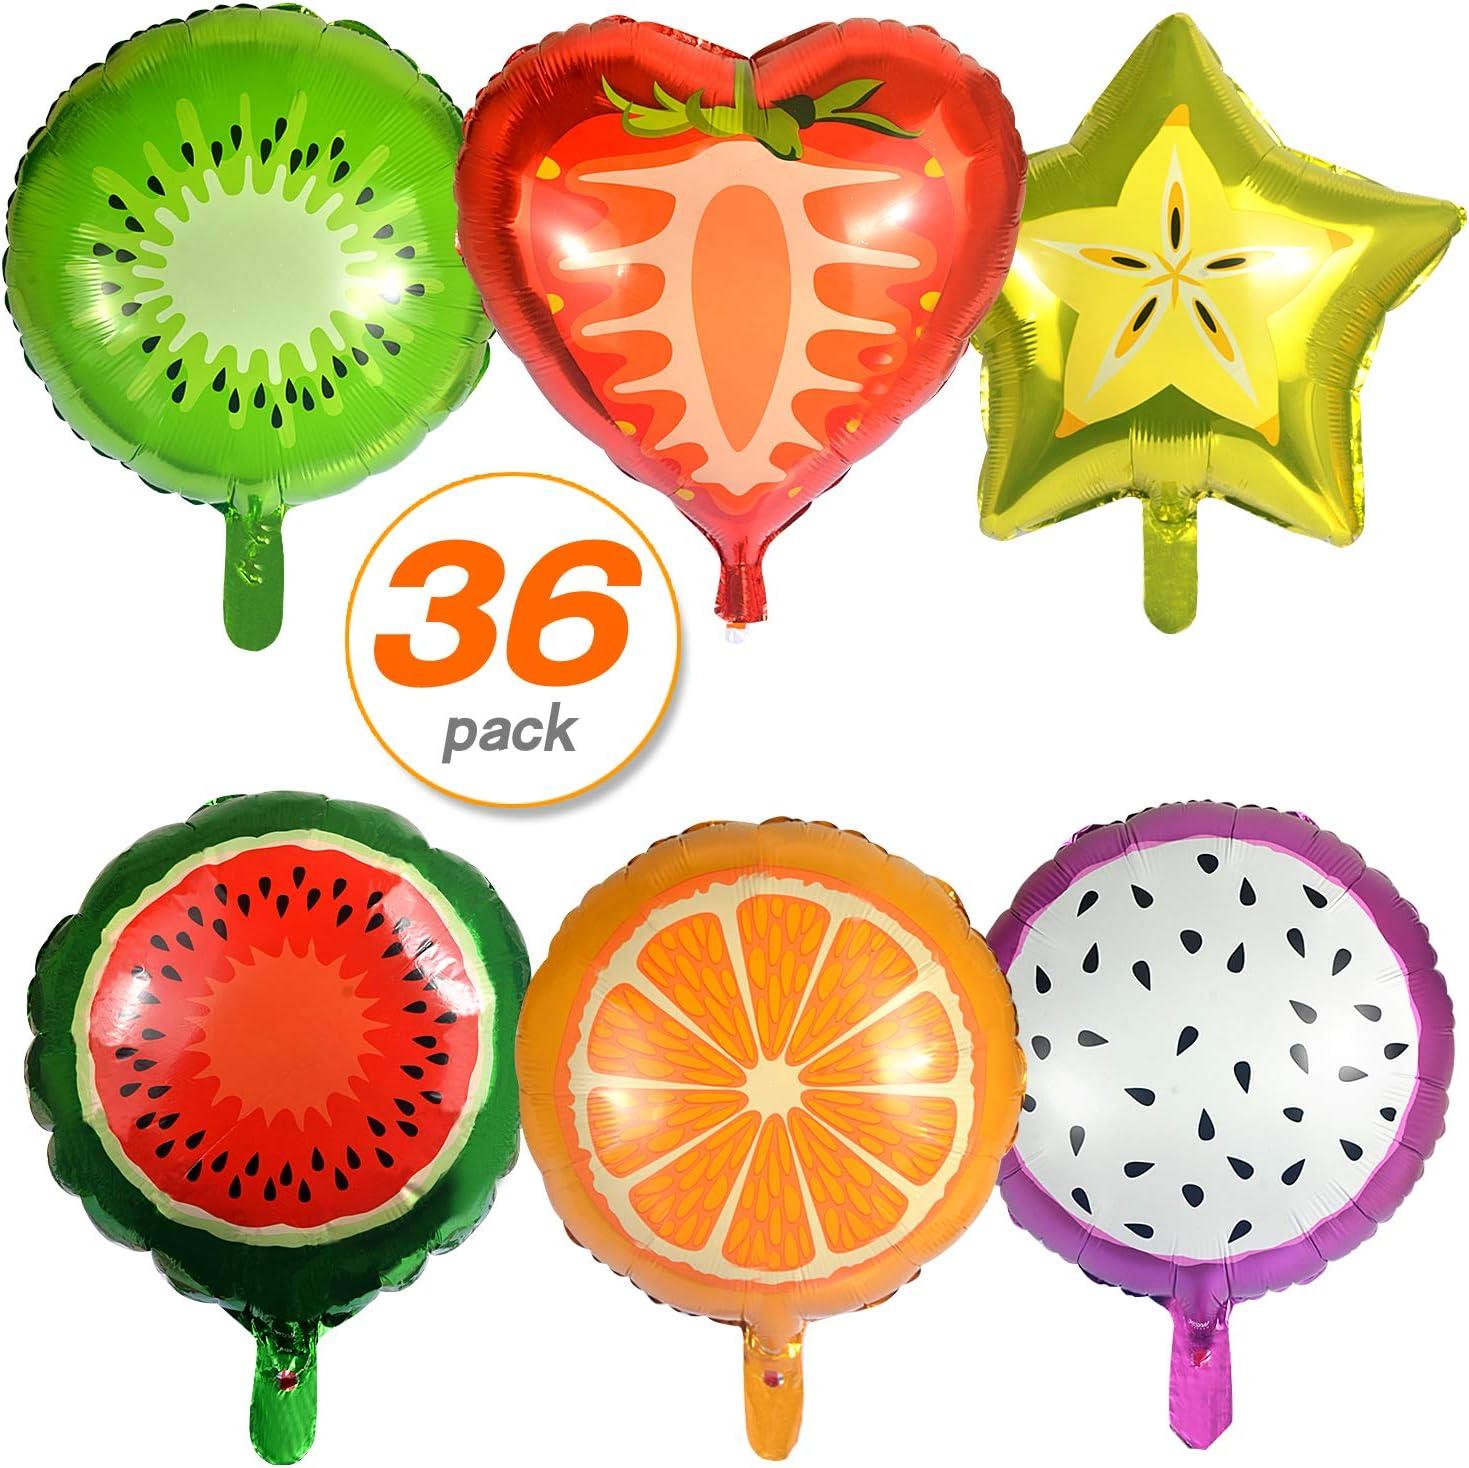 Orange Fruit Shape Foil Balloons Large High Quality birthdays Wedding